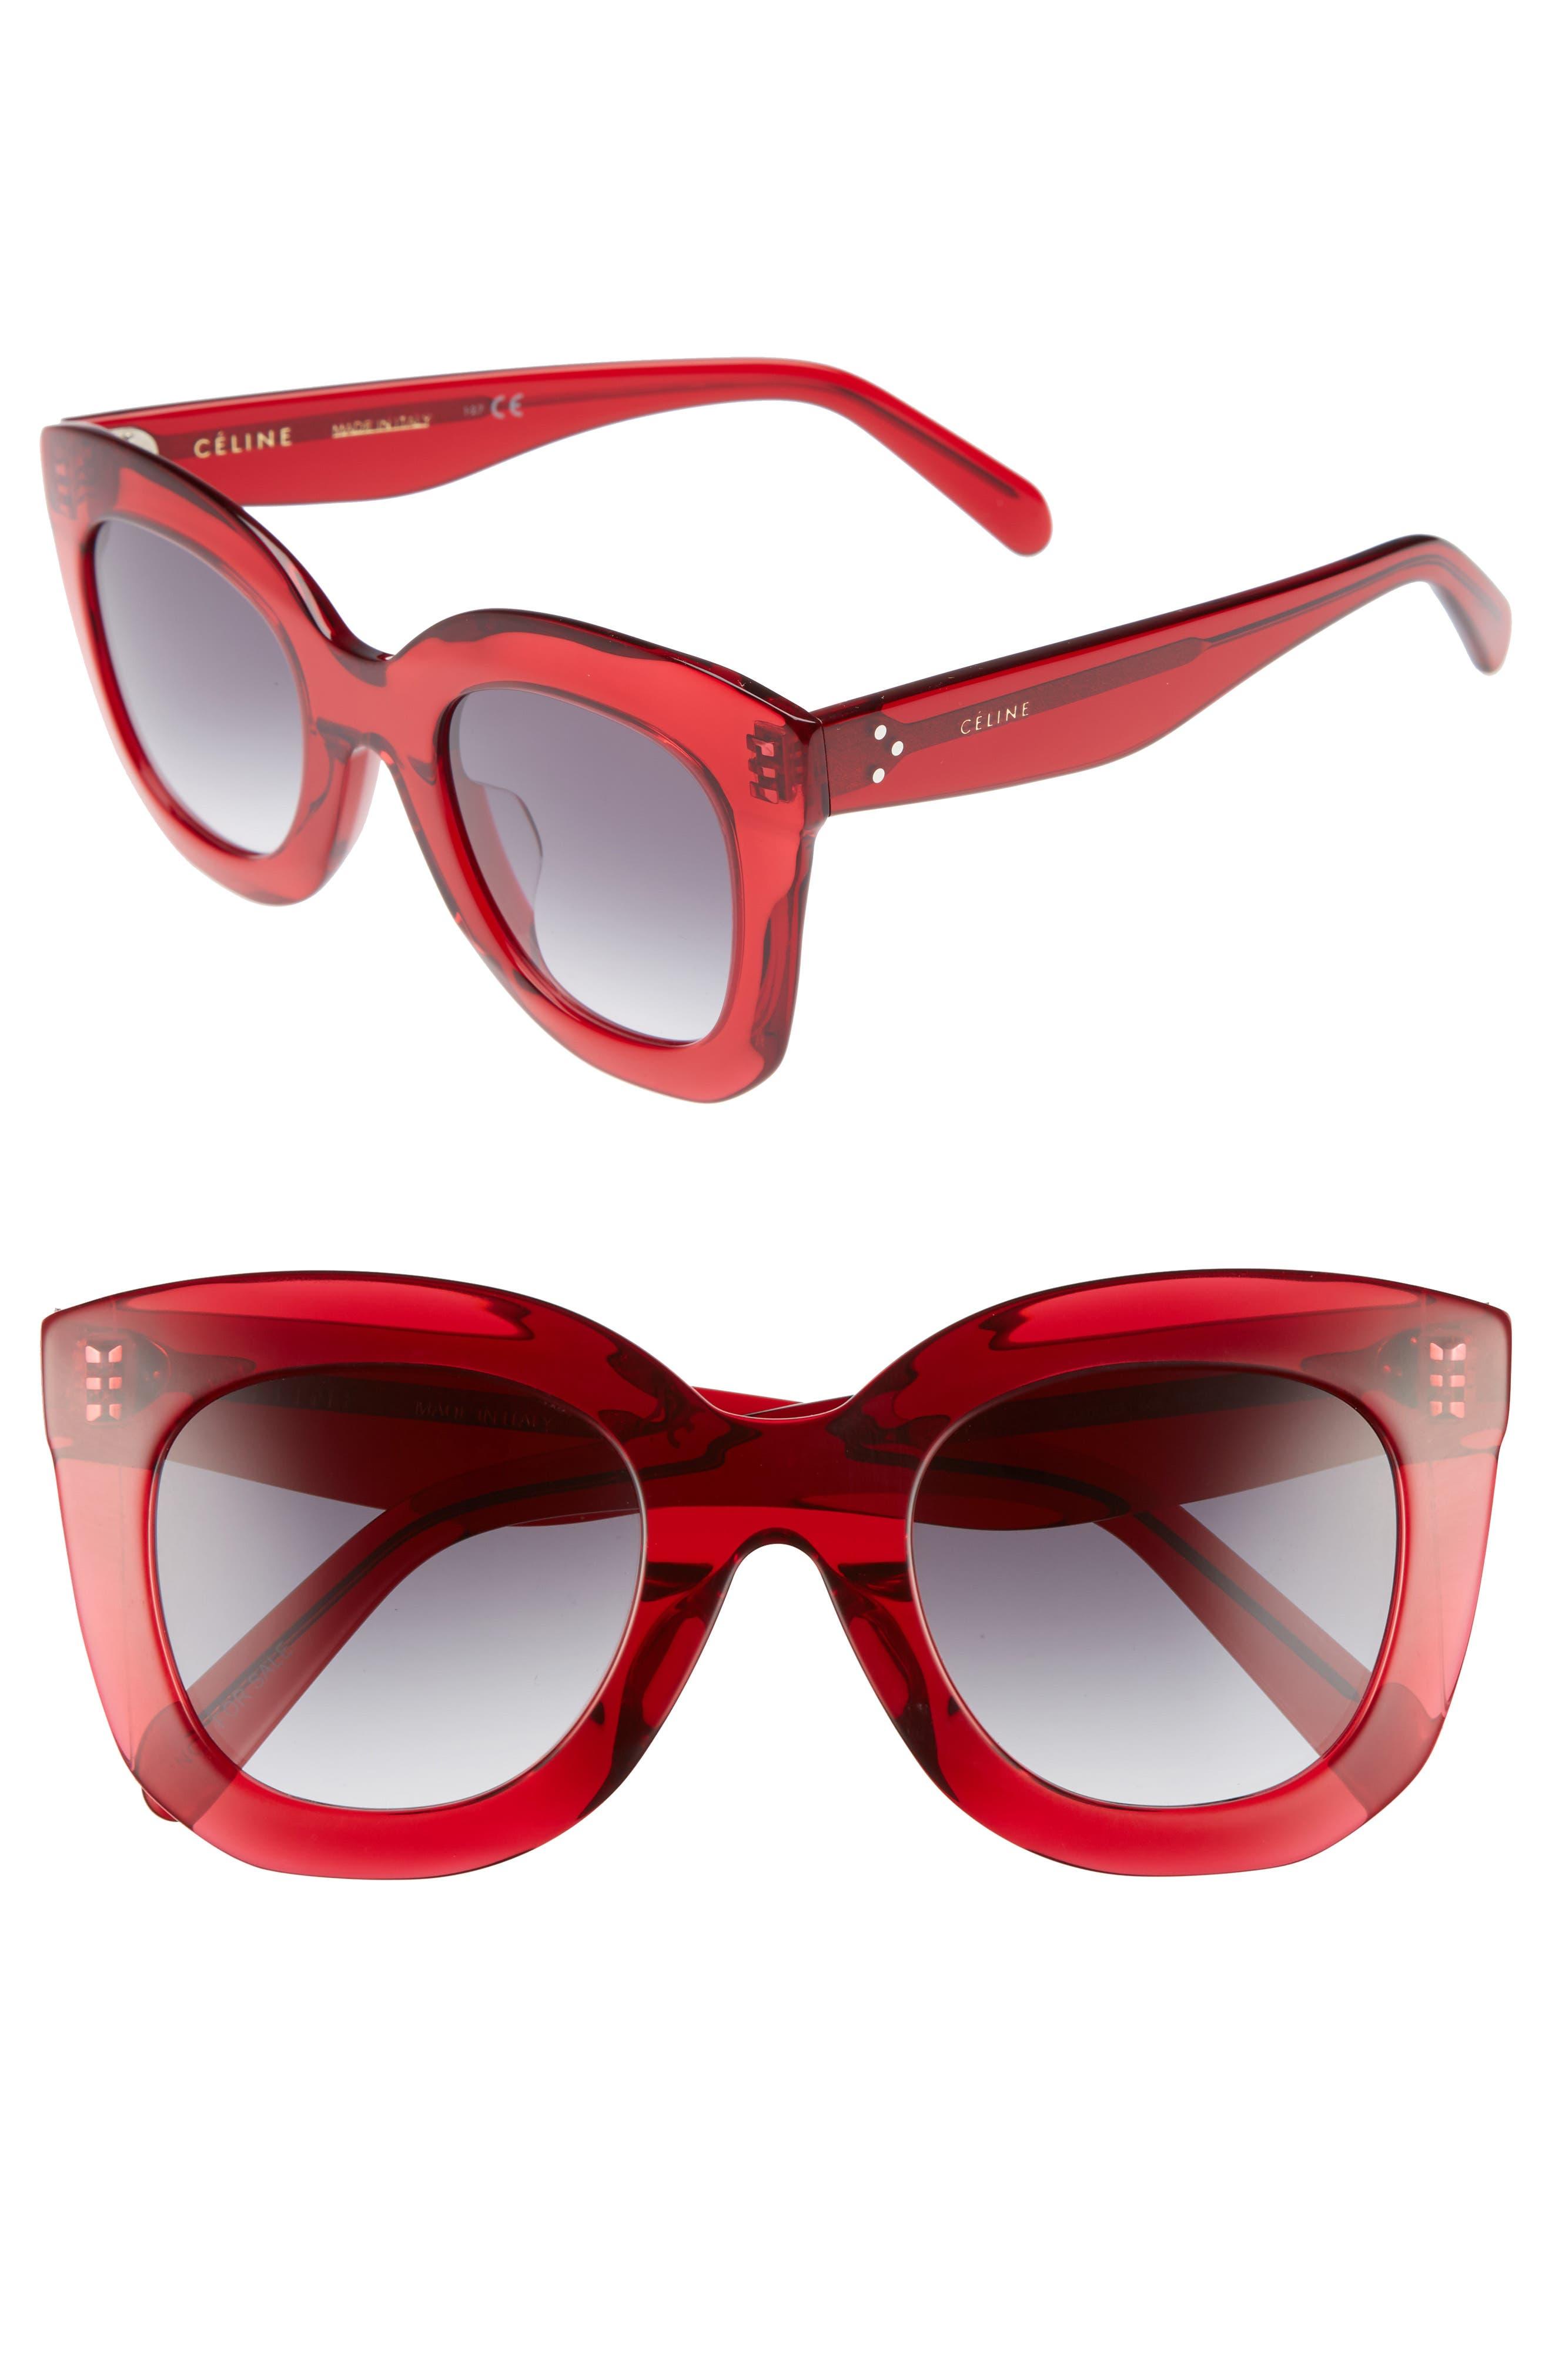 Main Image - Céline Special Fit 49mm Cat Eye Sunglasses